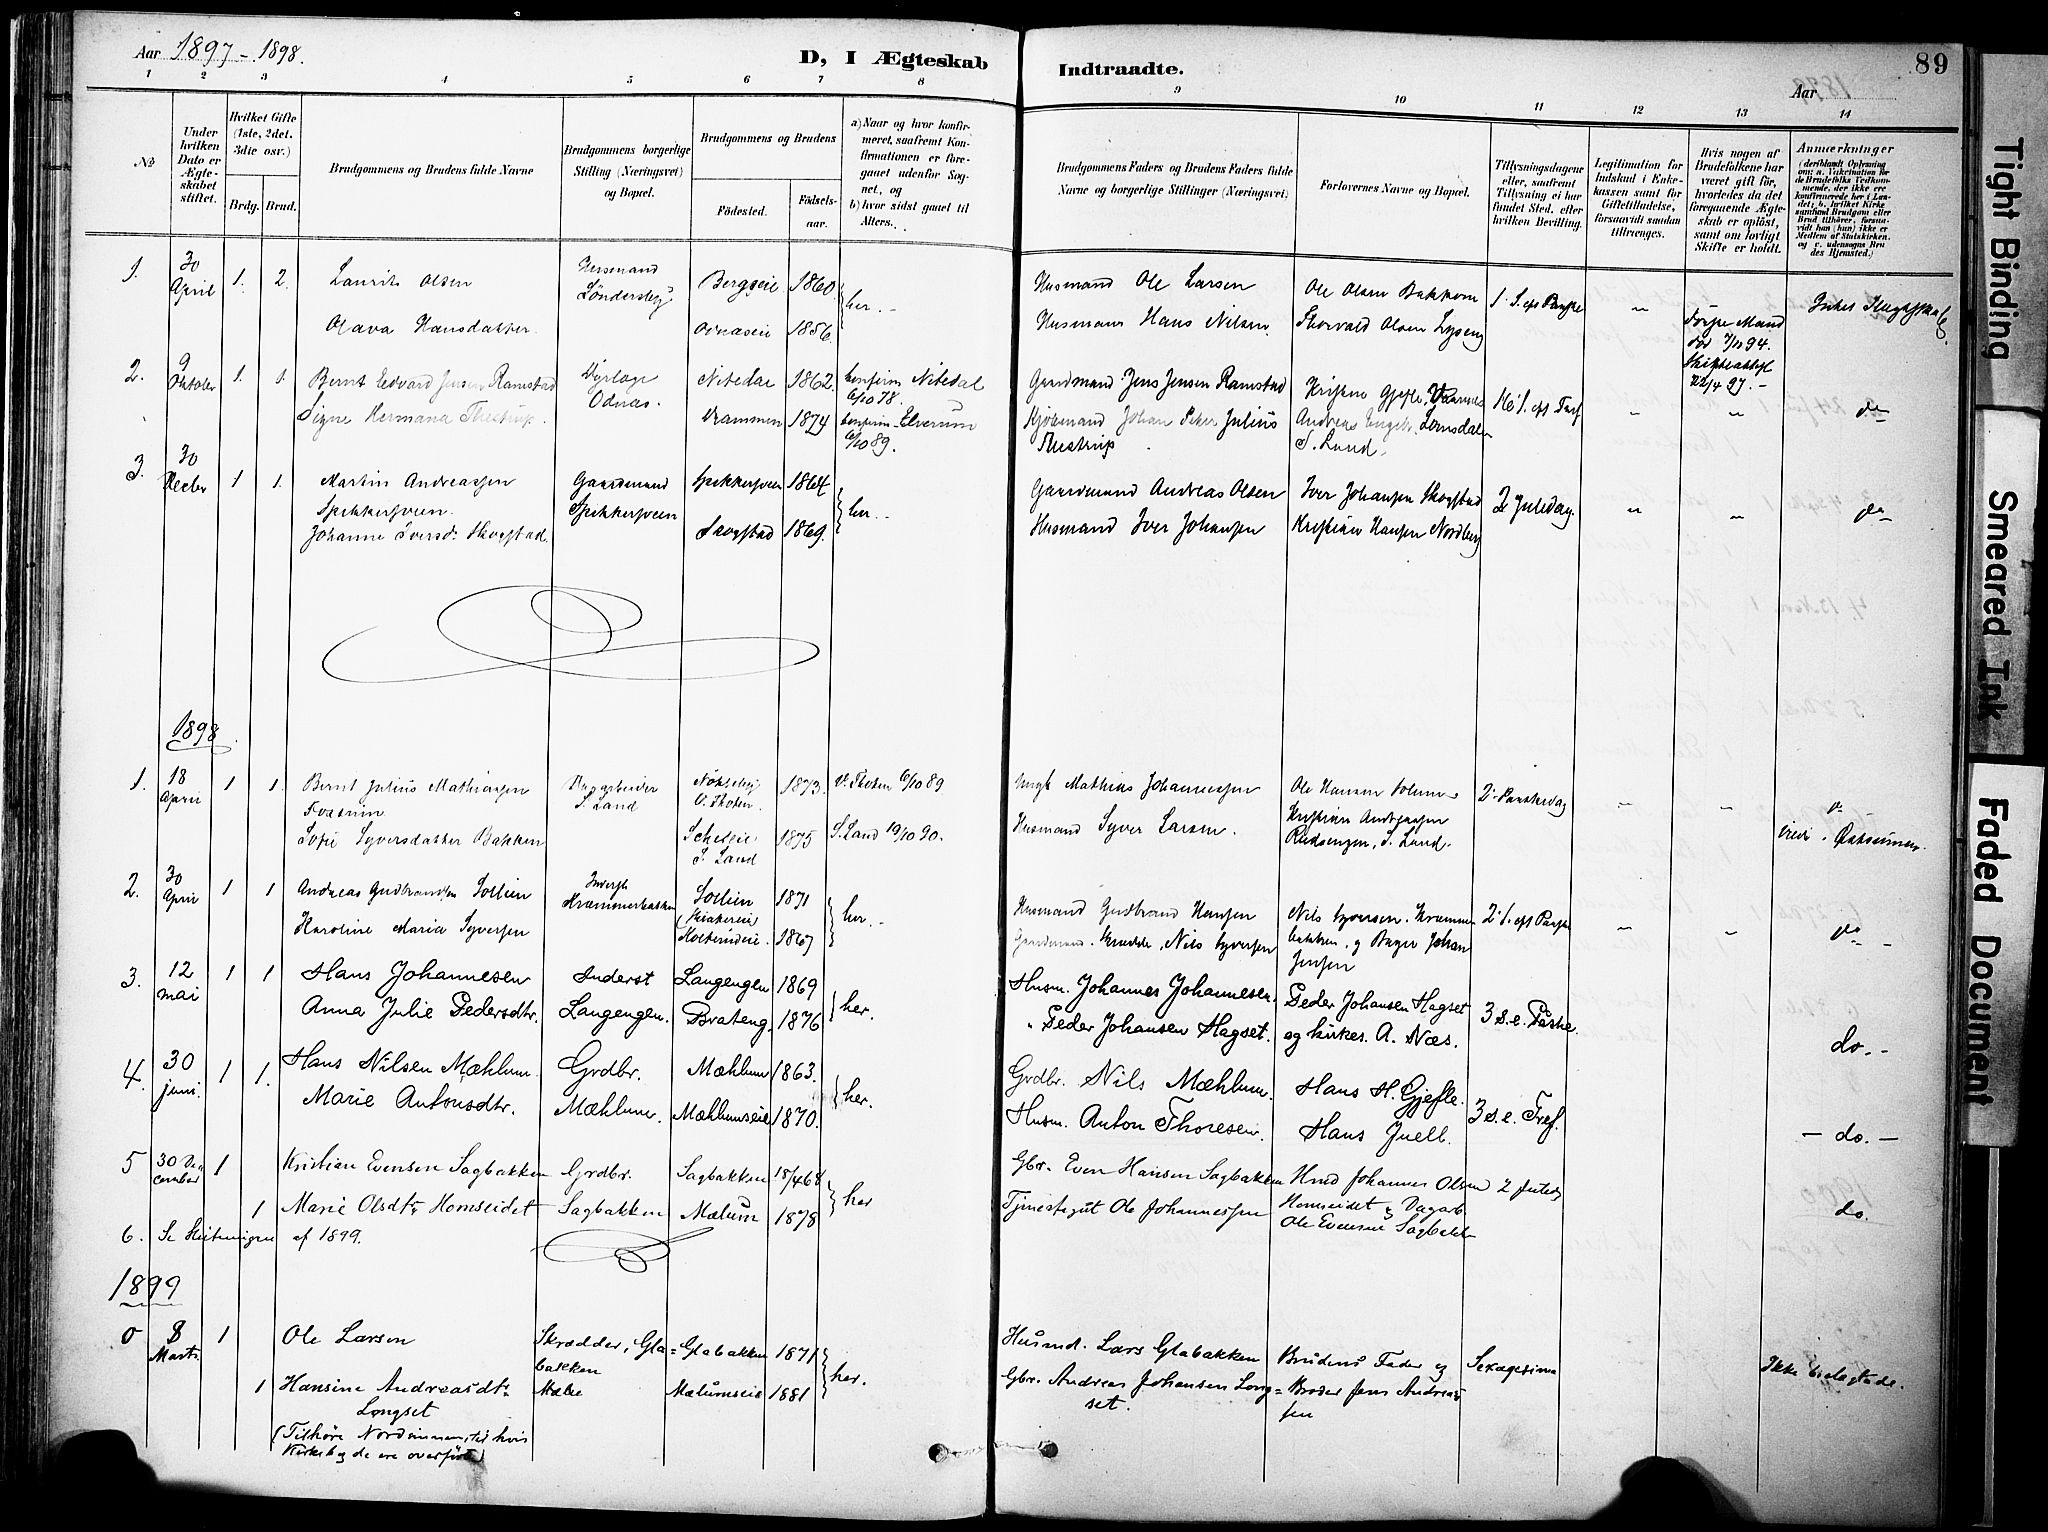 SAH, Nordre Land prestekontor, Ministerialbok nr. 6, 1897-1914, s. 89